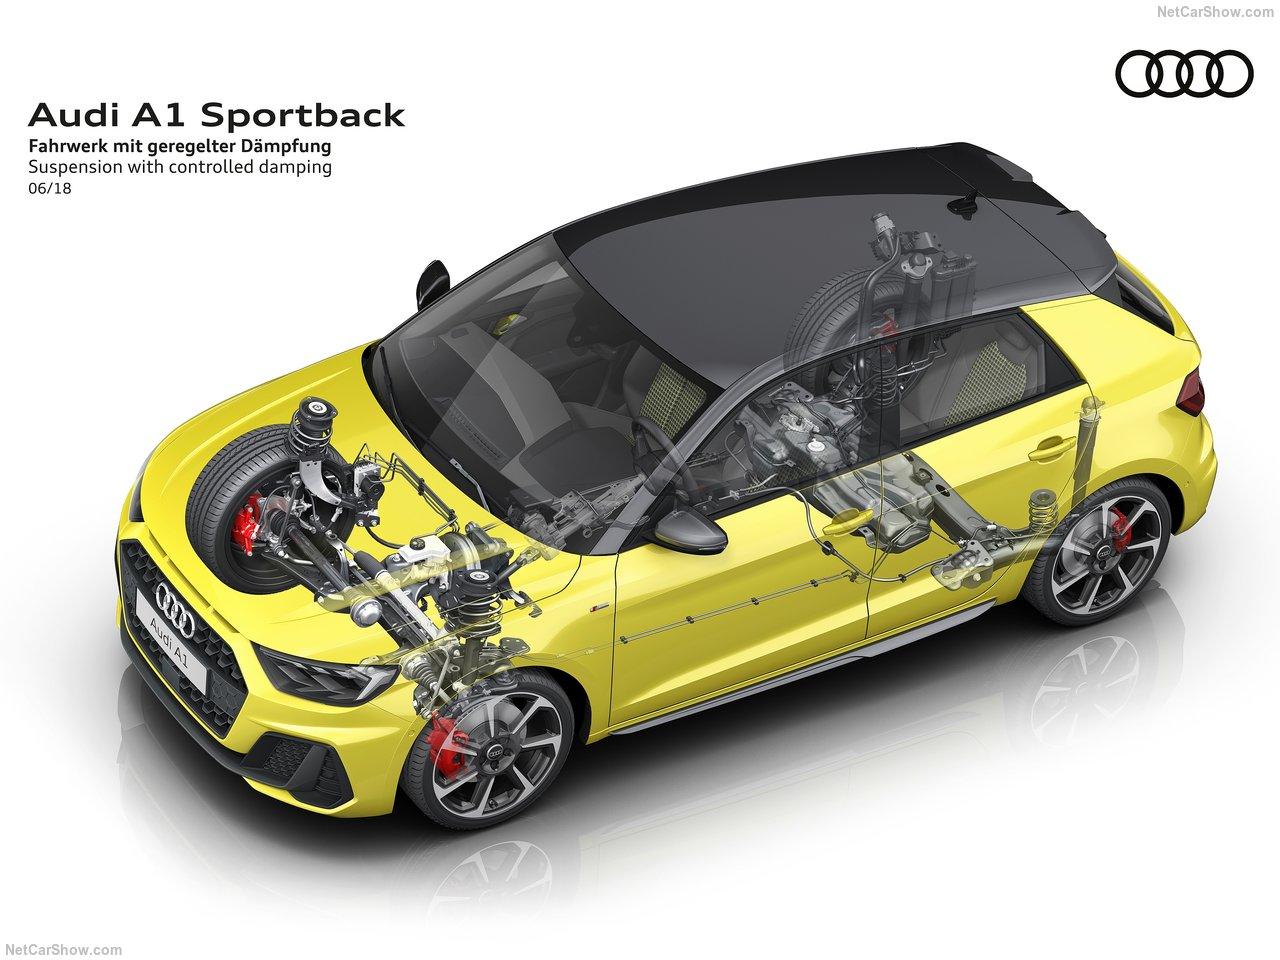 Audi-A1_Sportback-2019-1280-1b.jpg